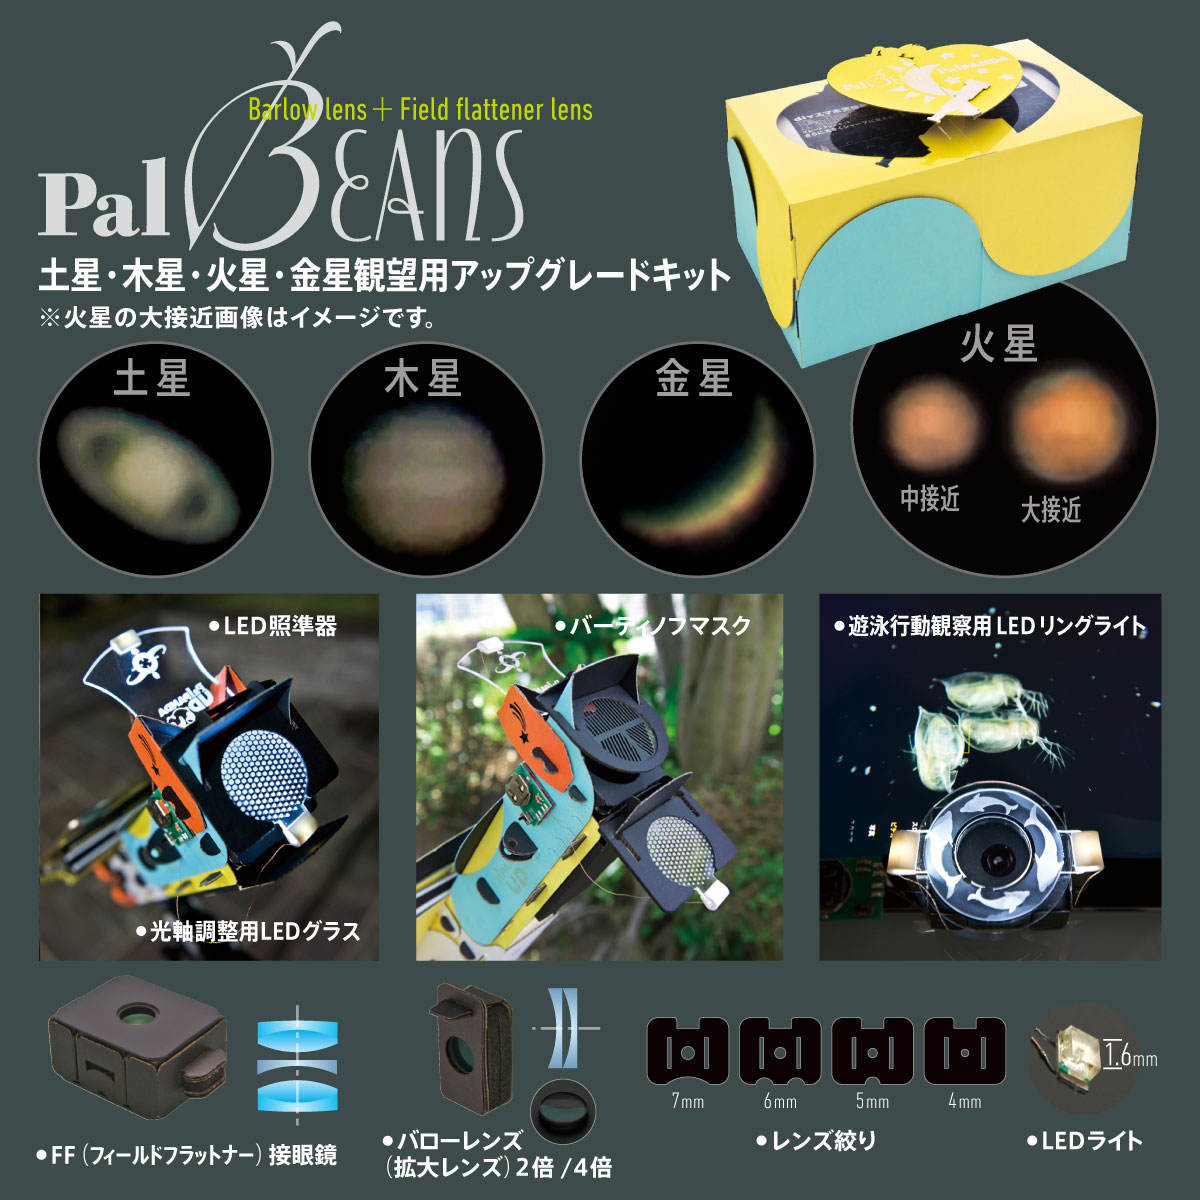 palbeans_PR03.jpg